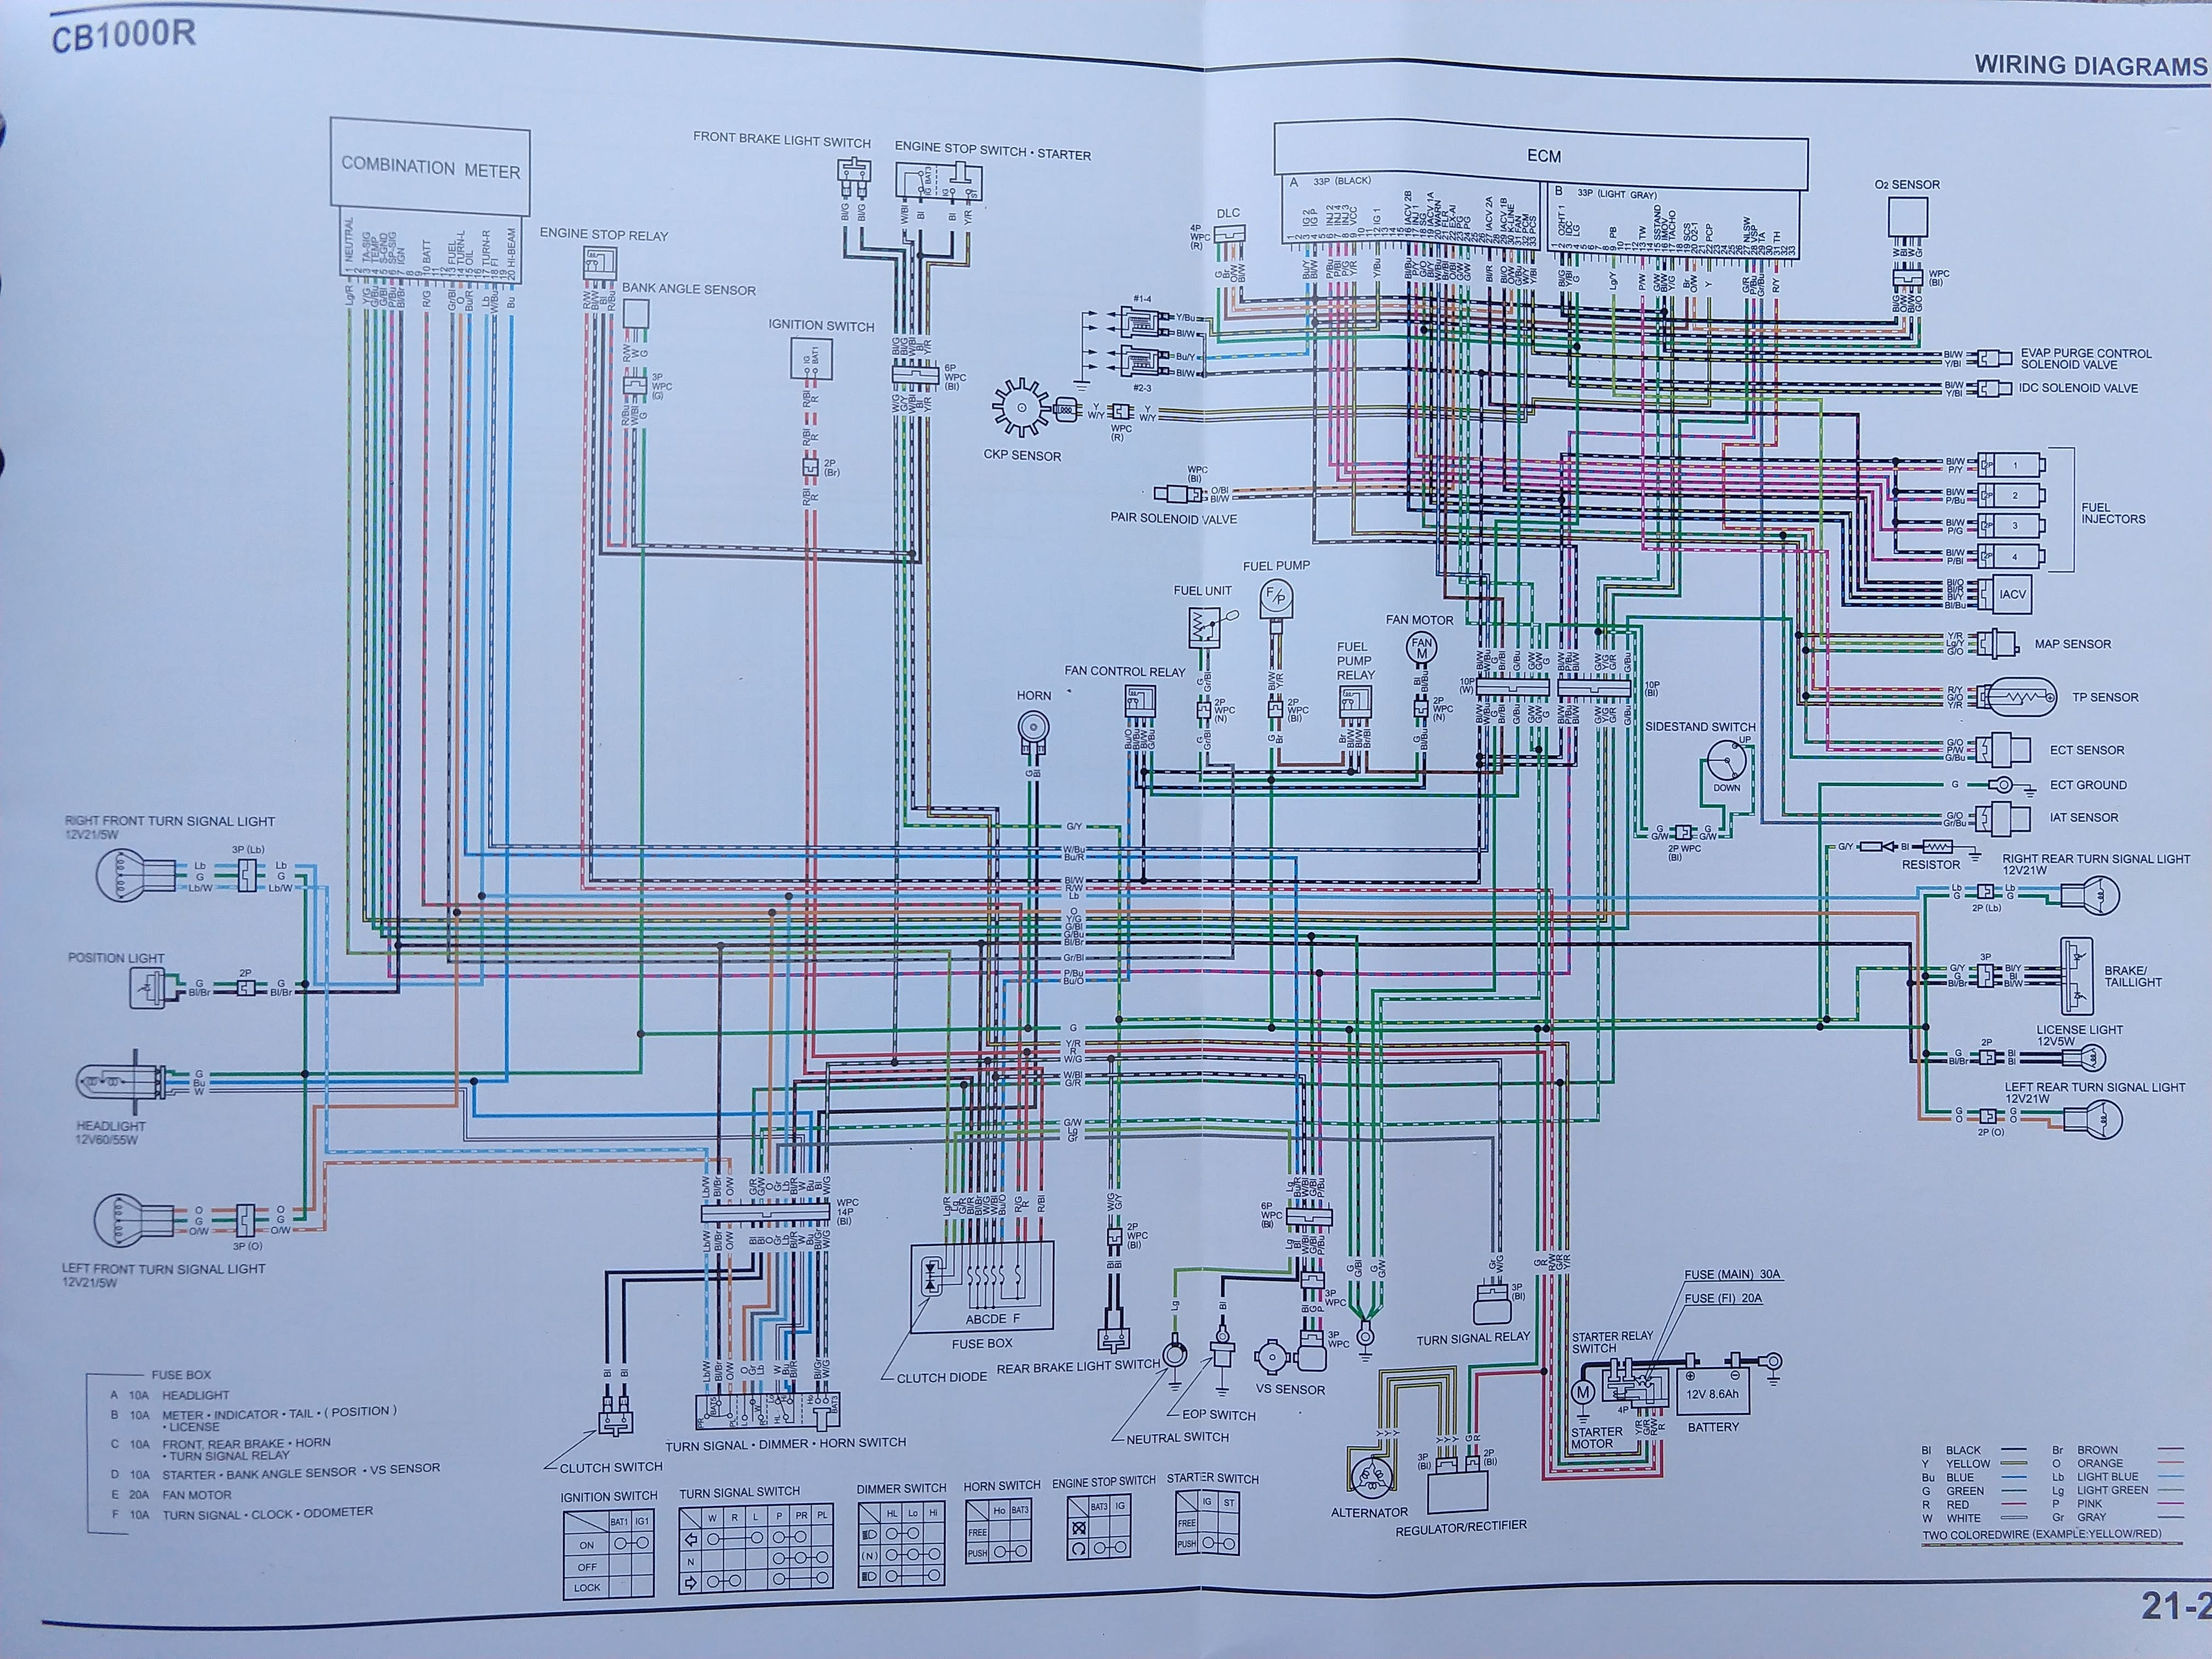 CB1000R North American specific Wiring Diagram | Honda CB1000R ForumHonda CB1000R Forum